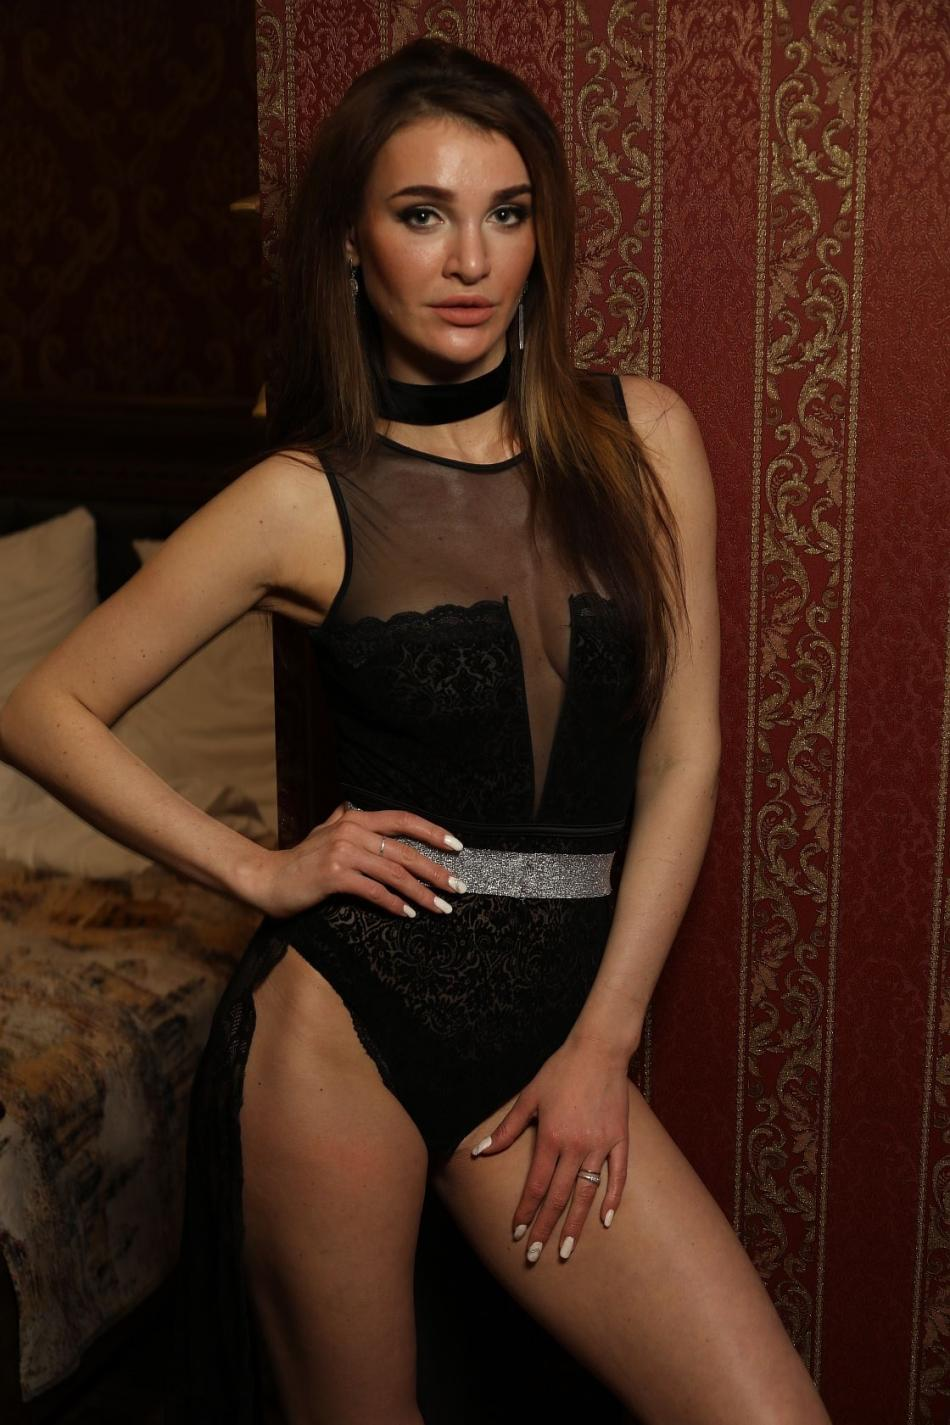 Ladyfordaddy.com Annet Escort Girl In New York 1123349 - 2 2